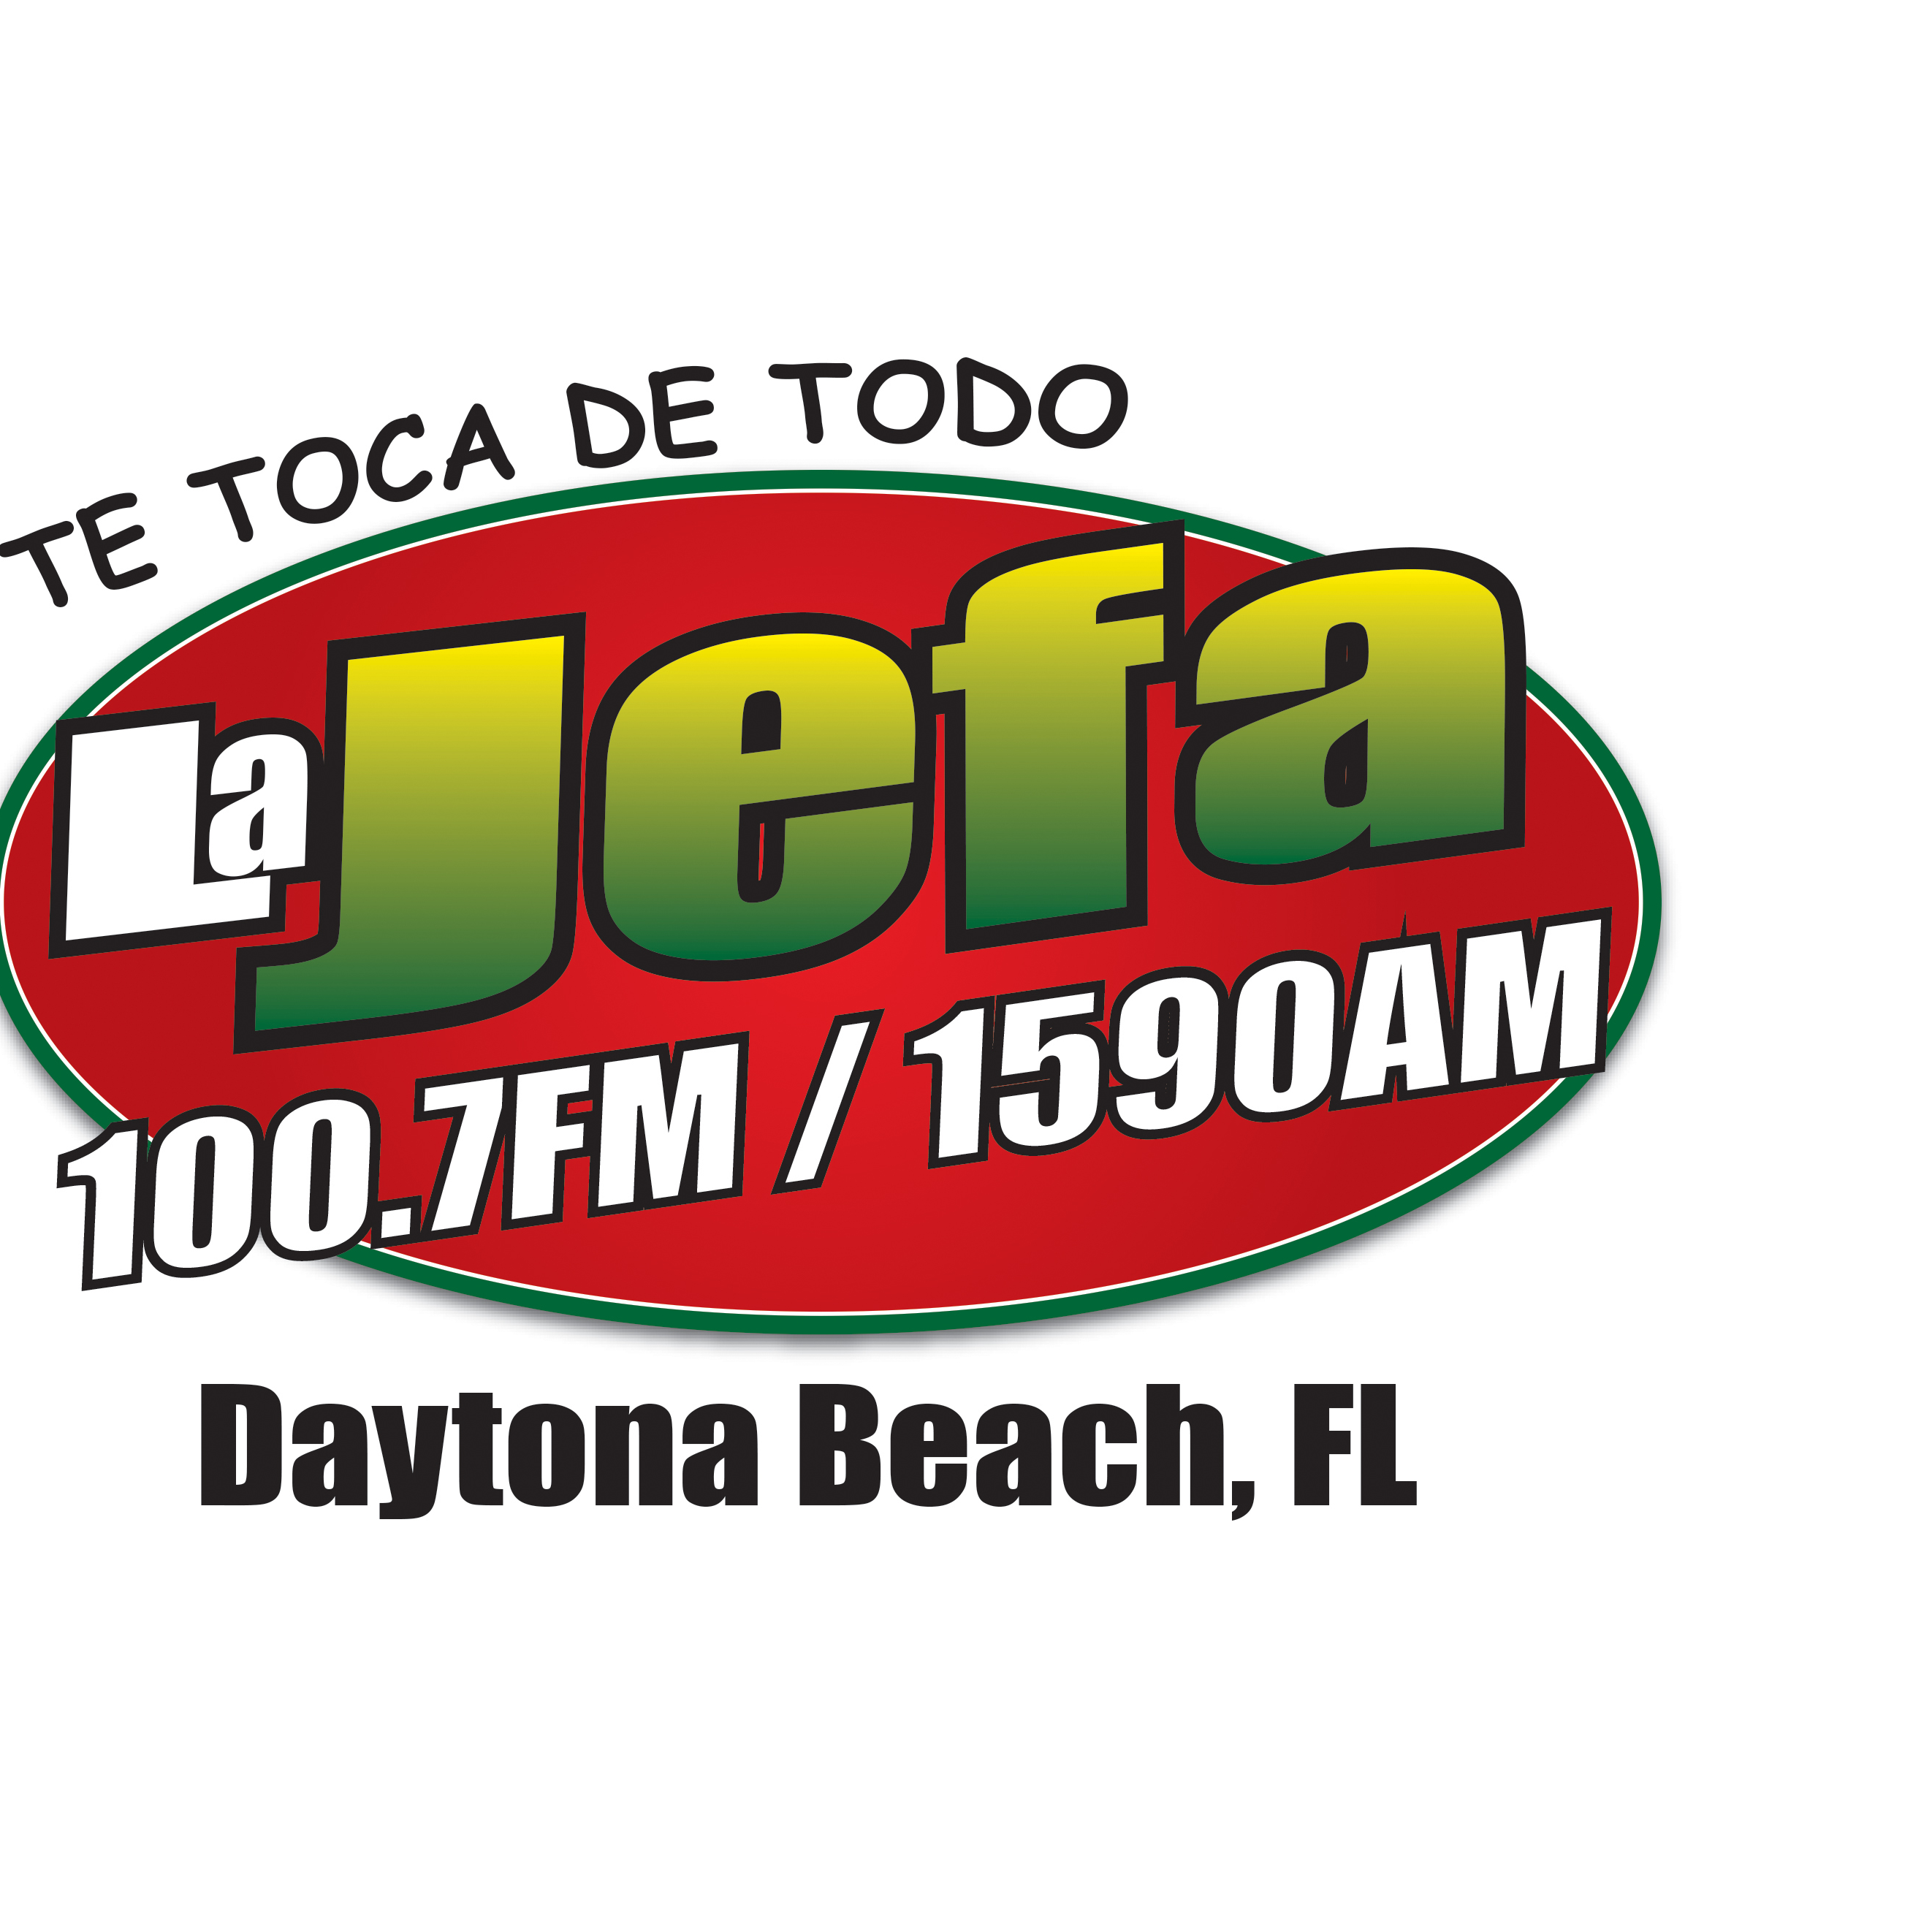 LaJefa1007FM